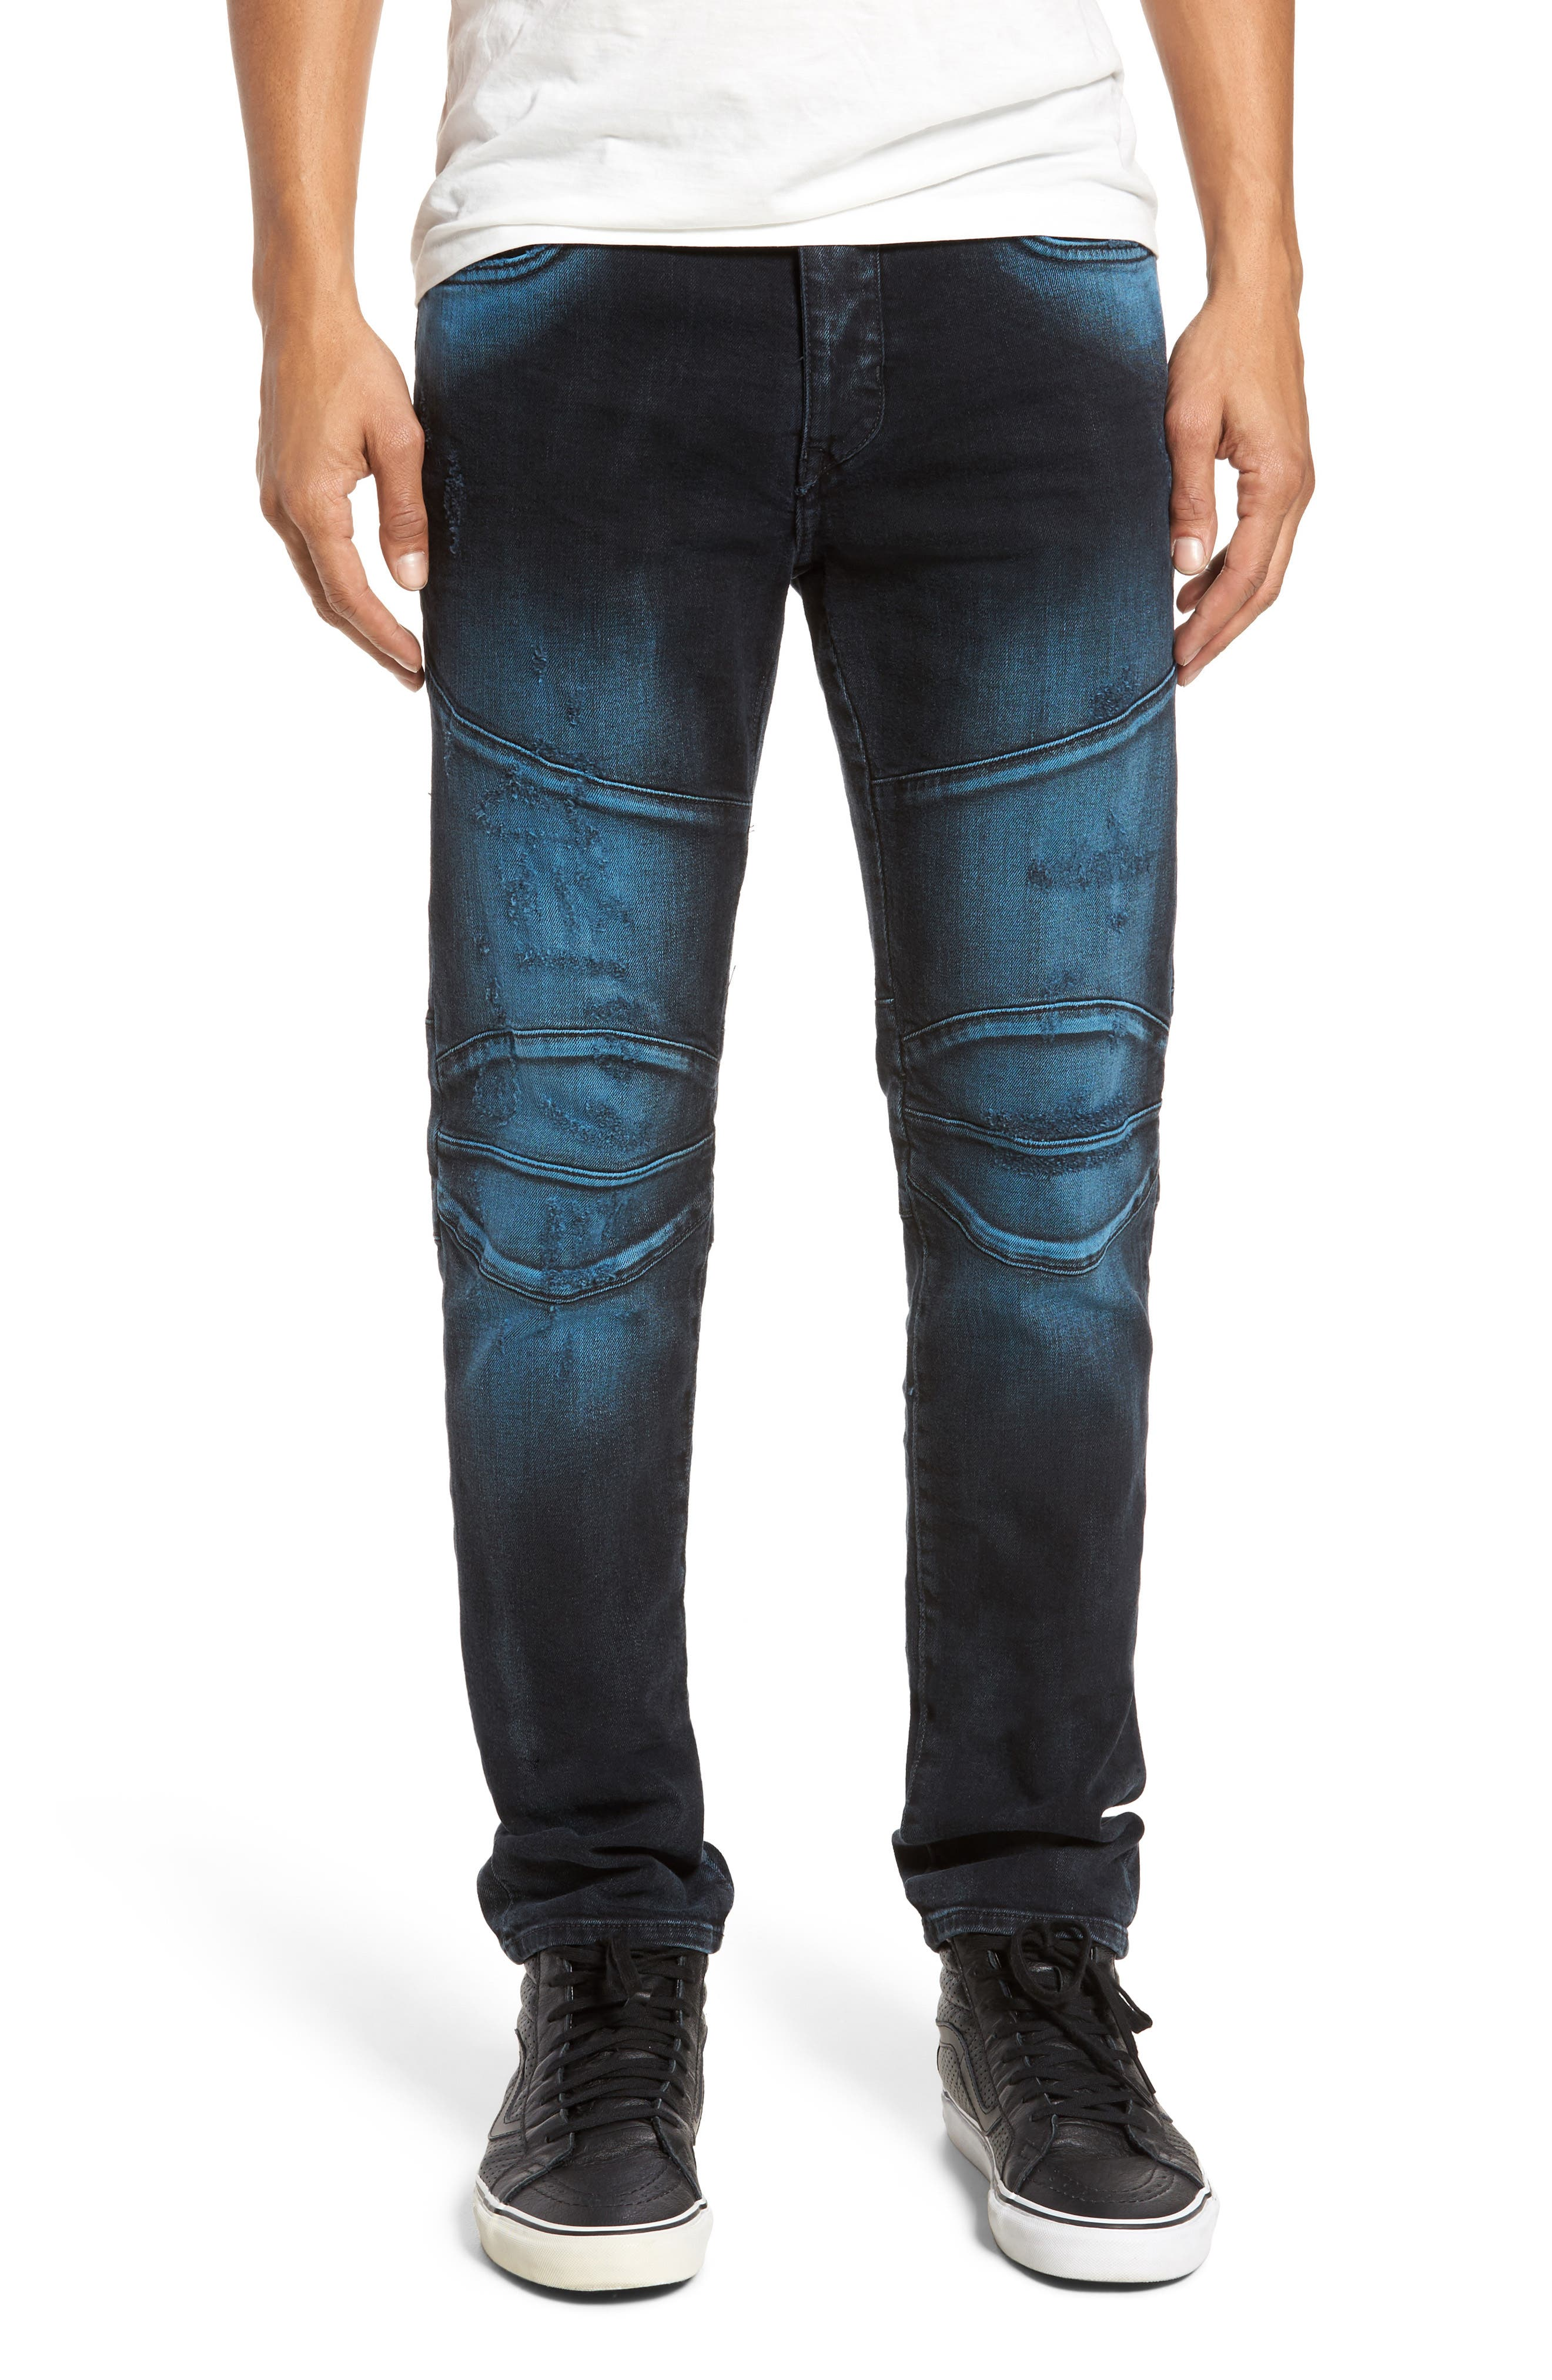 Rocco Skinny Fit Jeans,                         Main,                         color, Blue Blaze